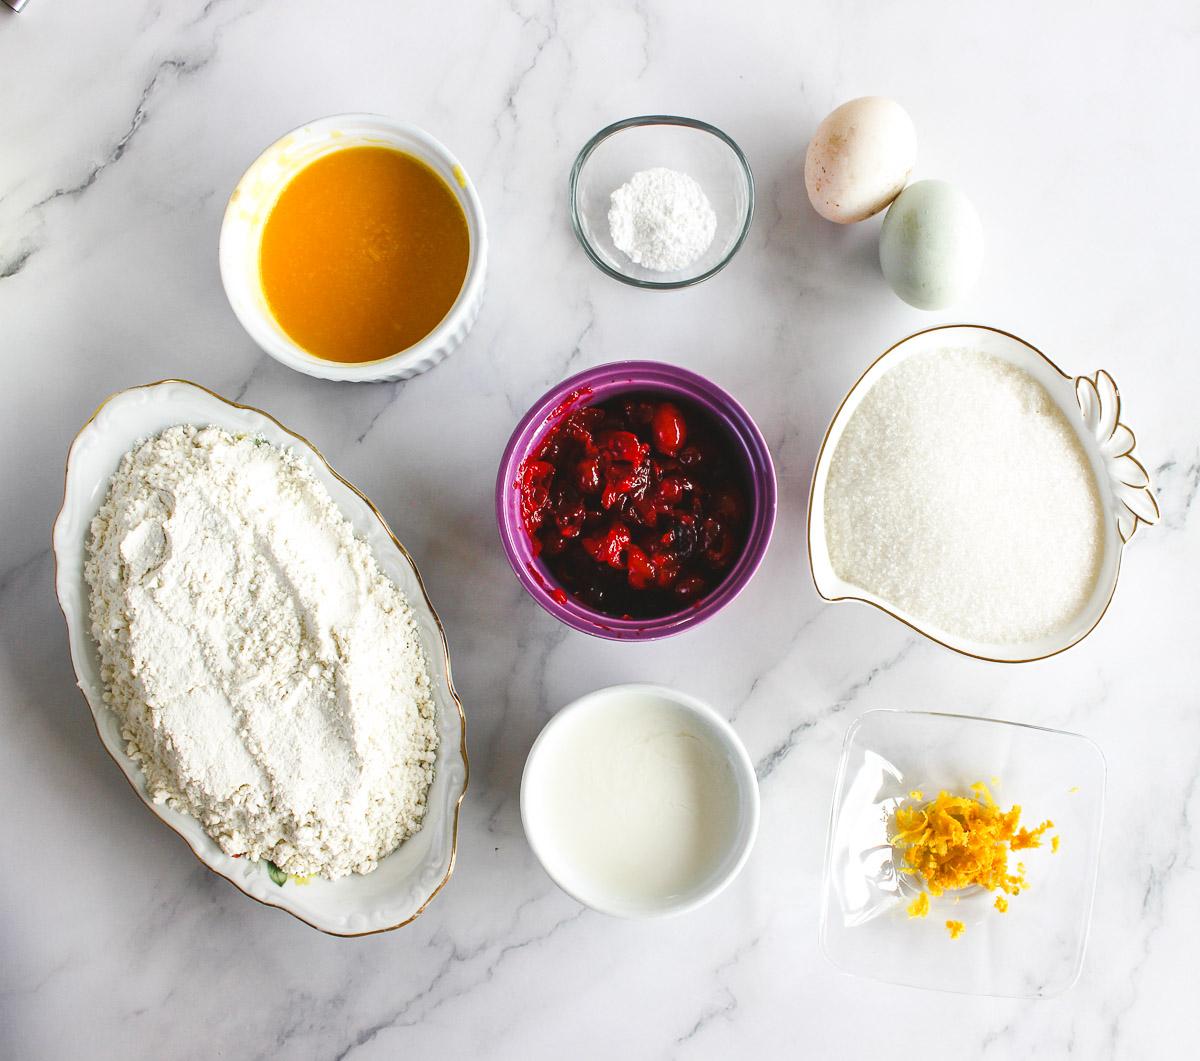 ingredients for cranberry orange pound cake